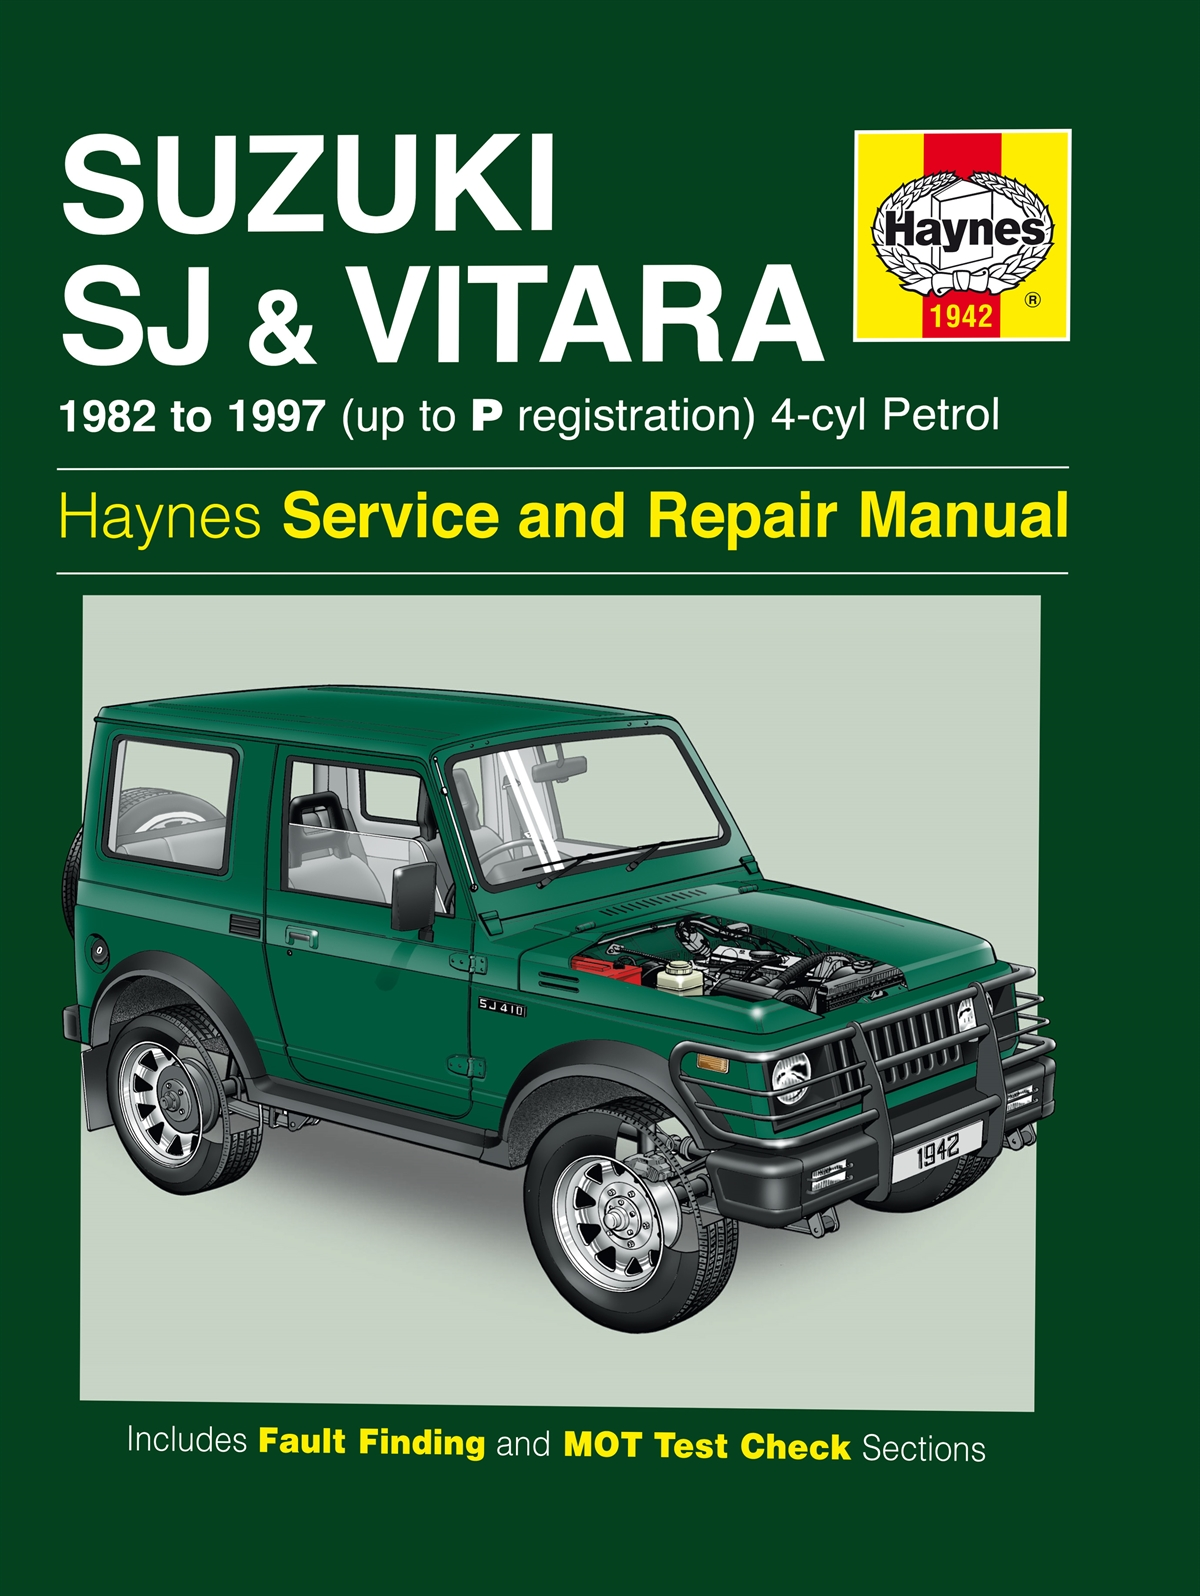 Haynes manual Suzuki sx4